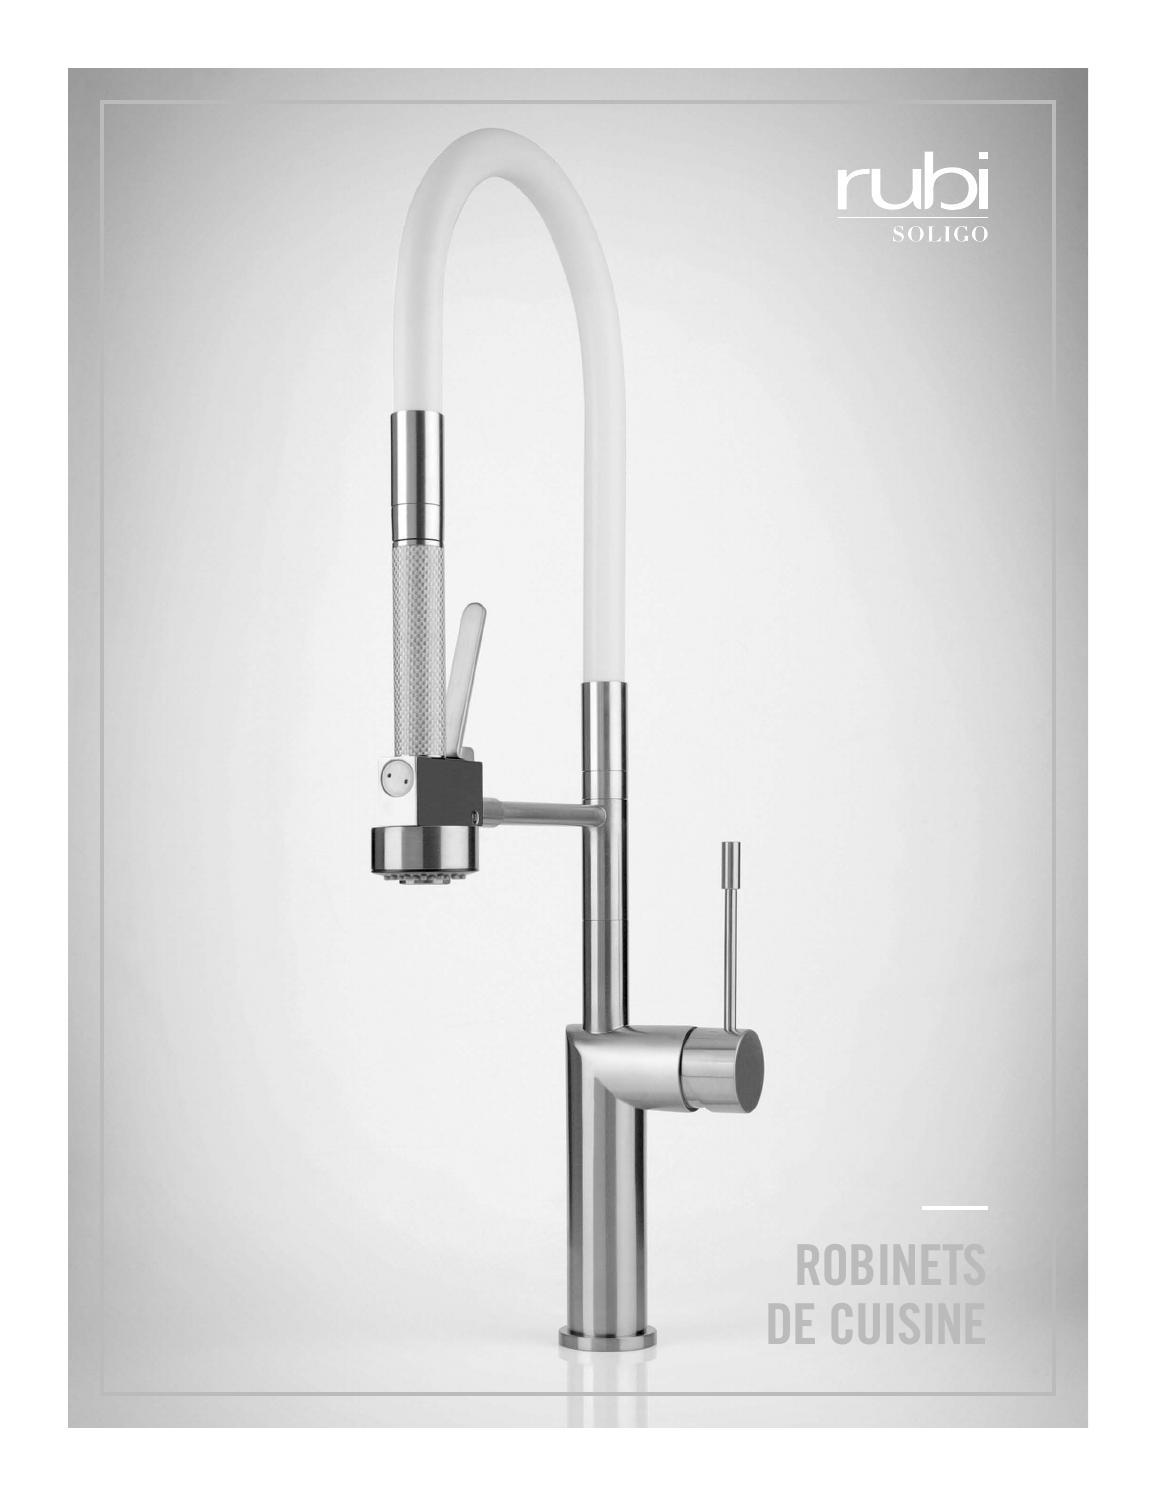 robinets de cuisine kitchen faucets lp rubi by rubi soligo 2 issuu. Black Bedroom Furniture Sets. Home Design Ideas